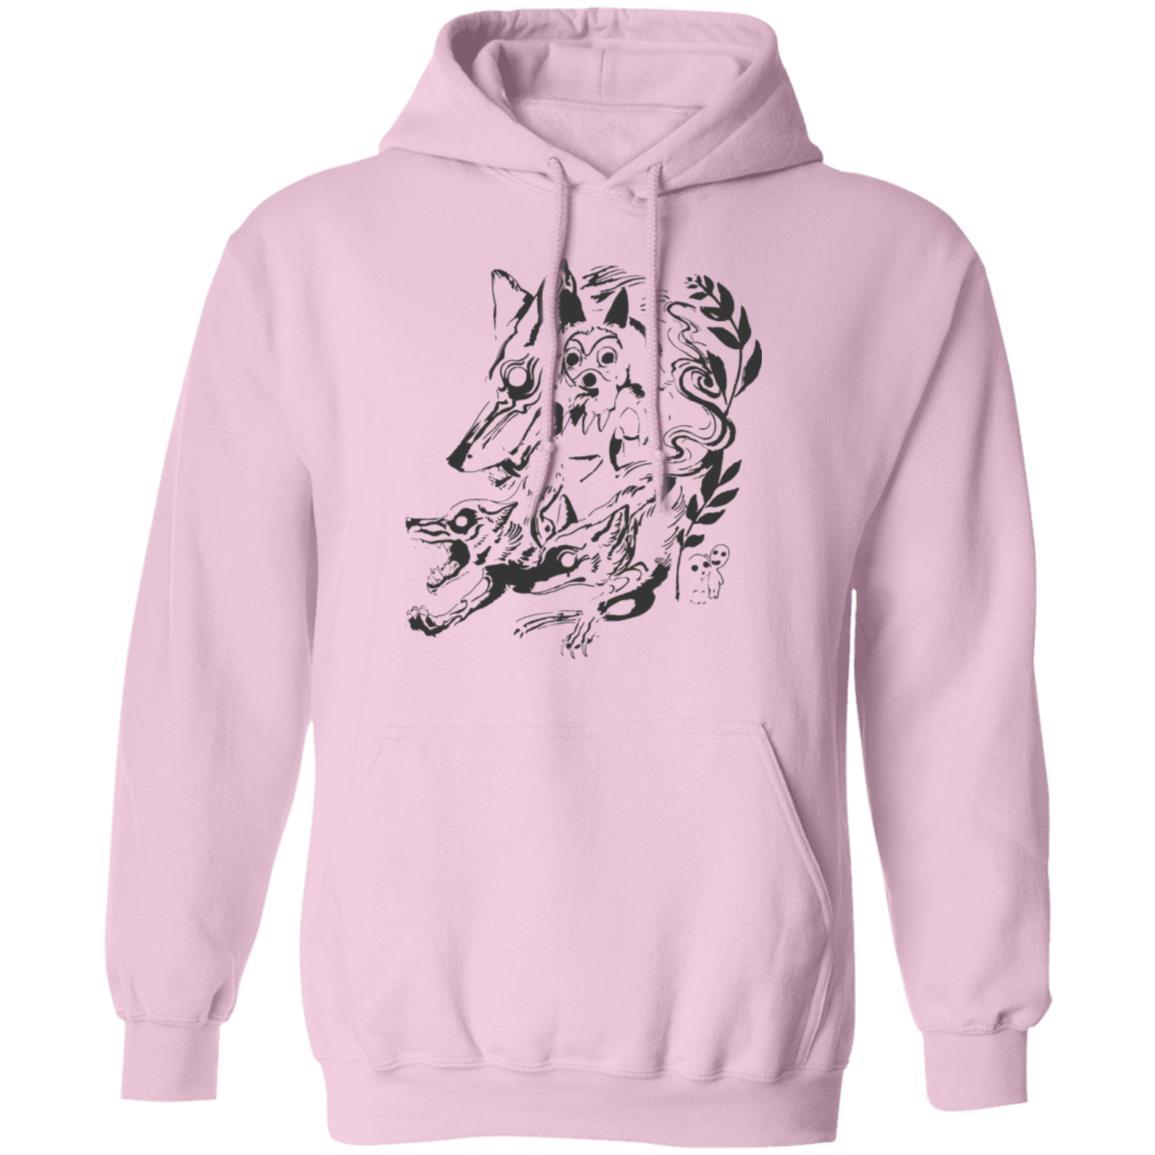 Princess Mononoke and The Wolf Creative Art Hoodie Unisex